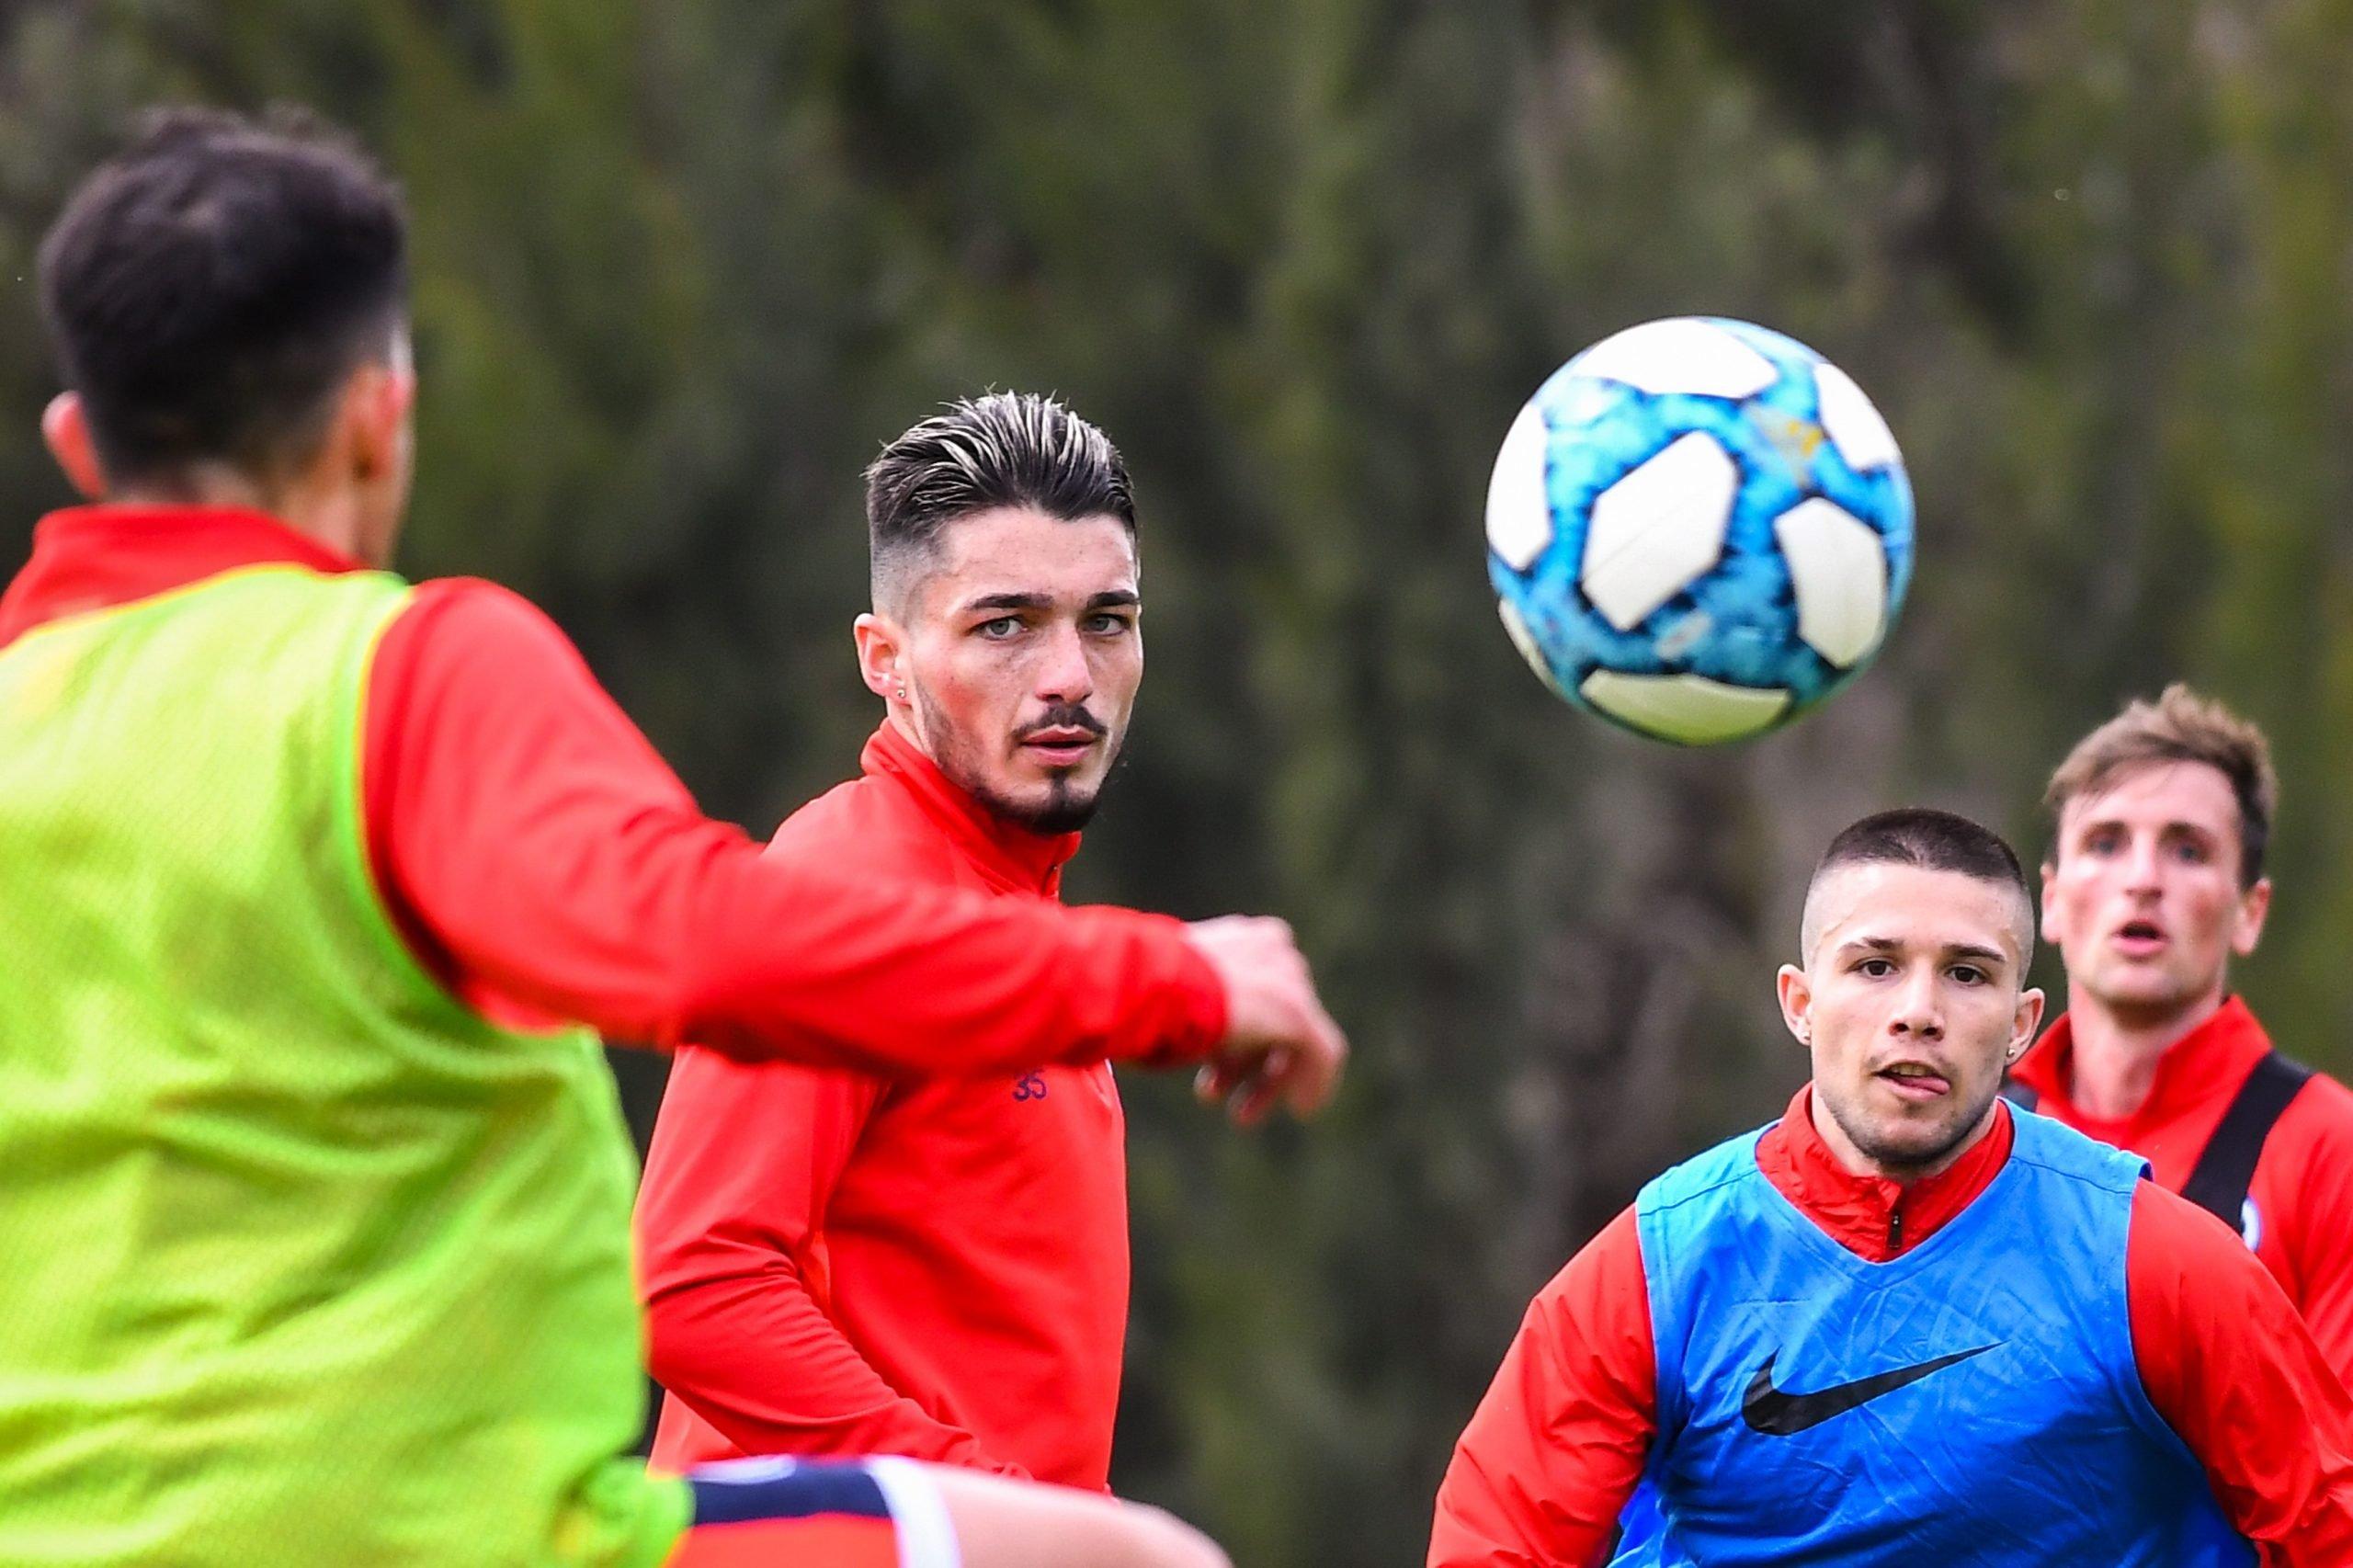 San Lorenzo desestimó una oferta de un reconocido club europeo por el piquense Matías Palacios